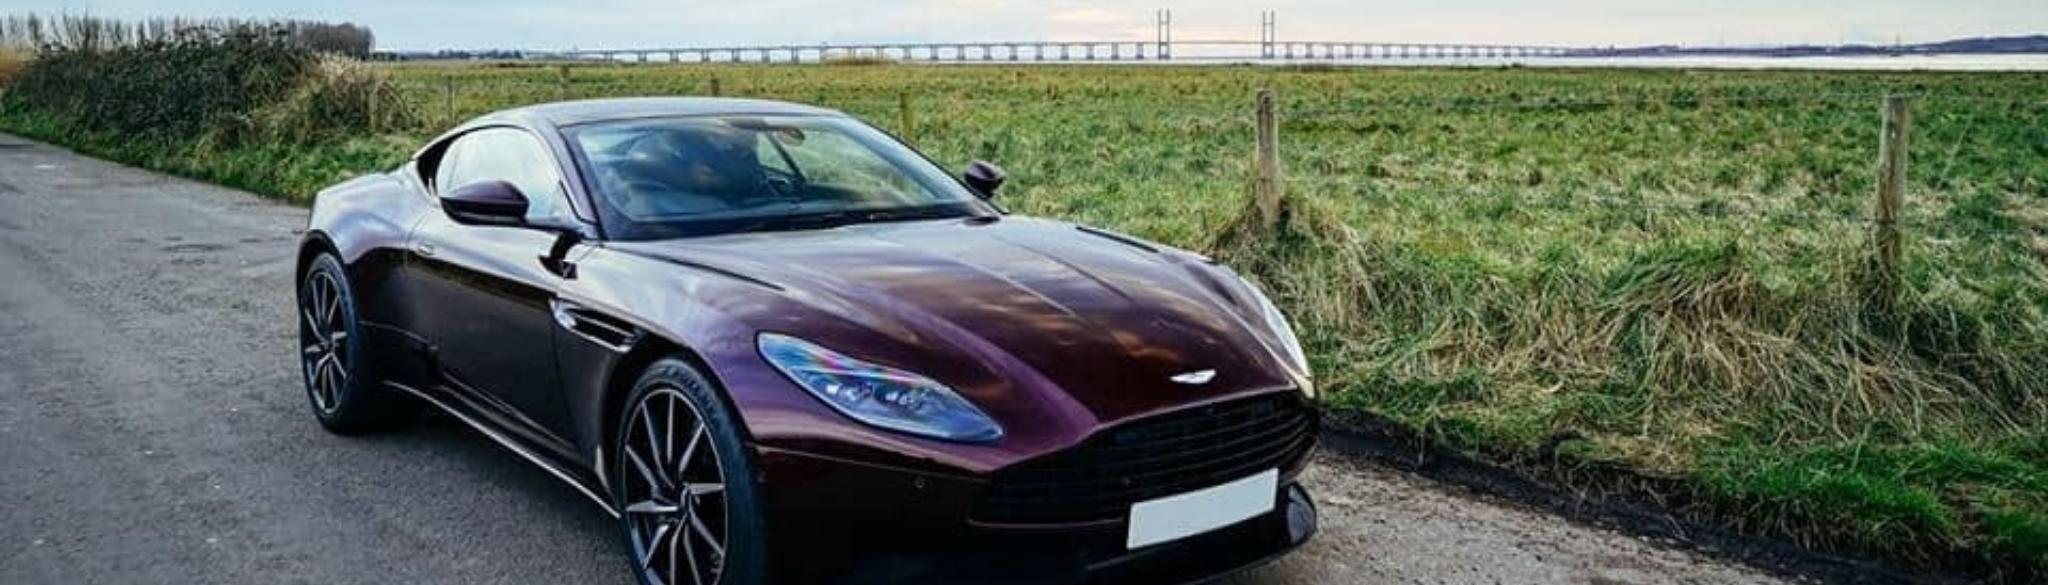 Aston Martin In Wales